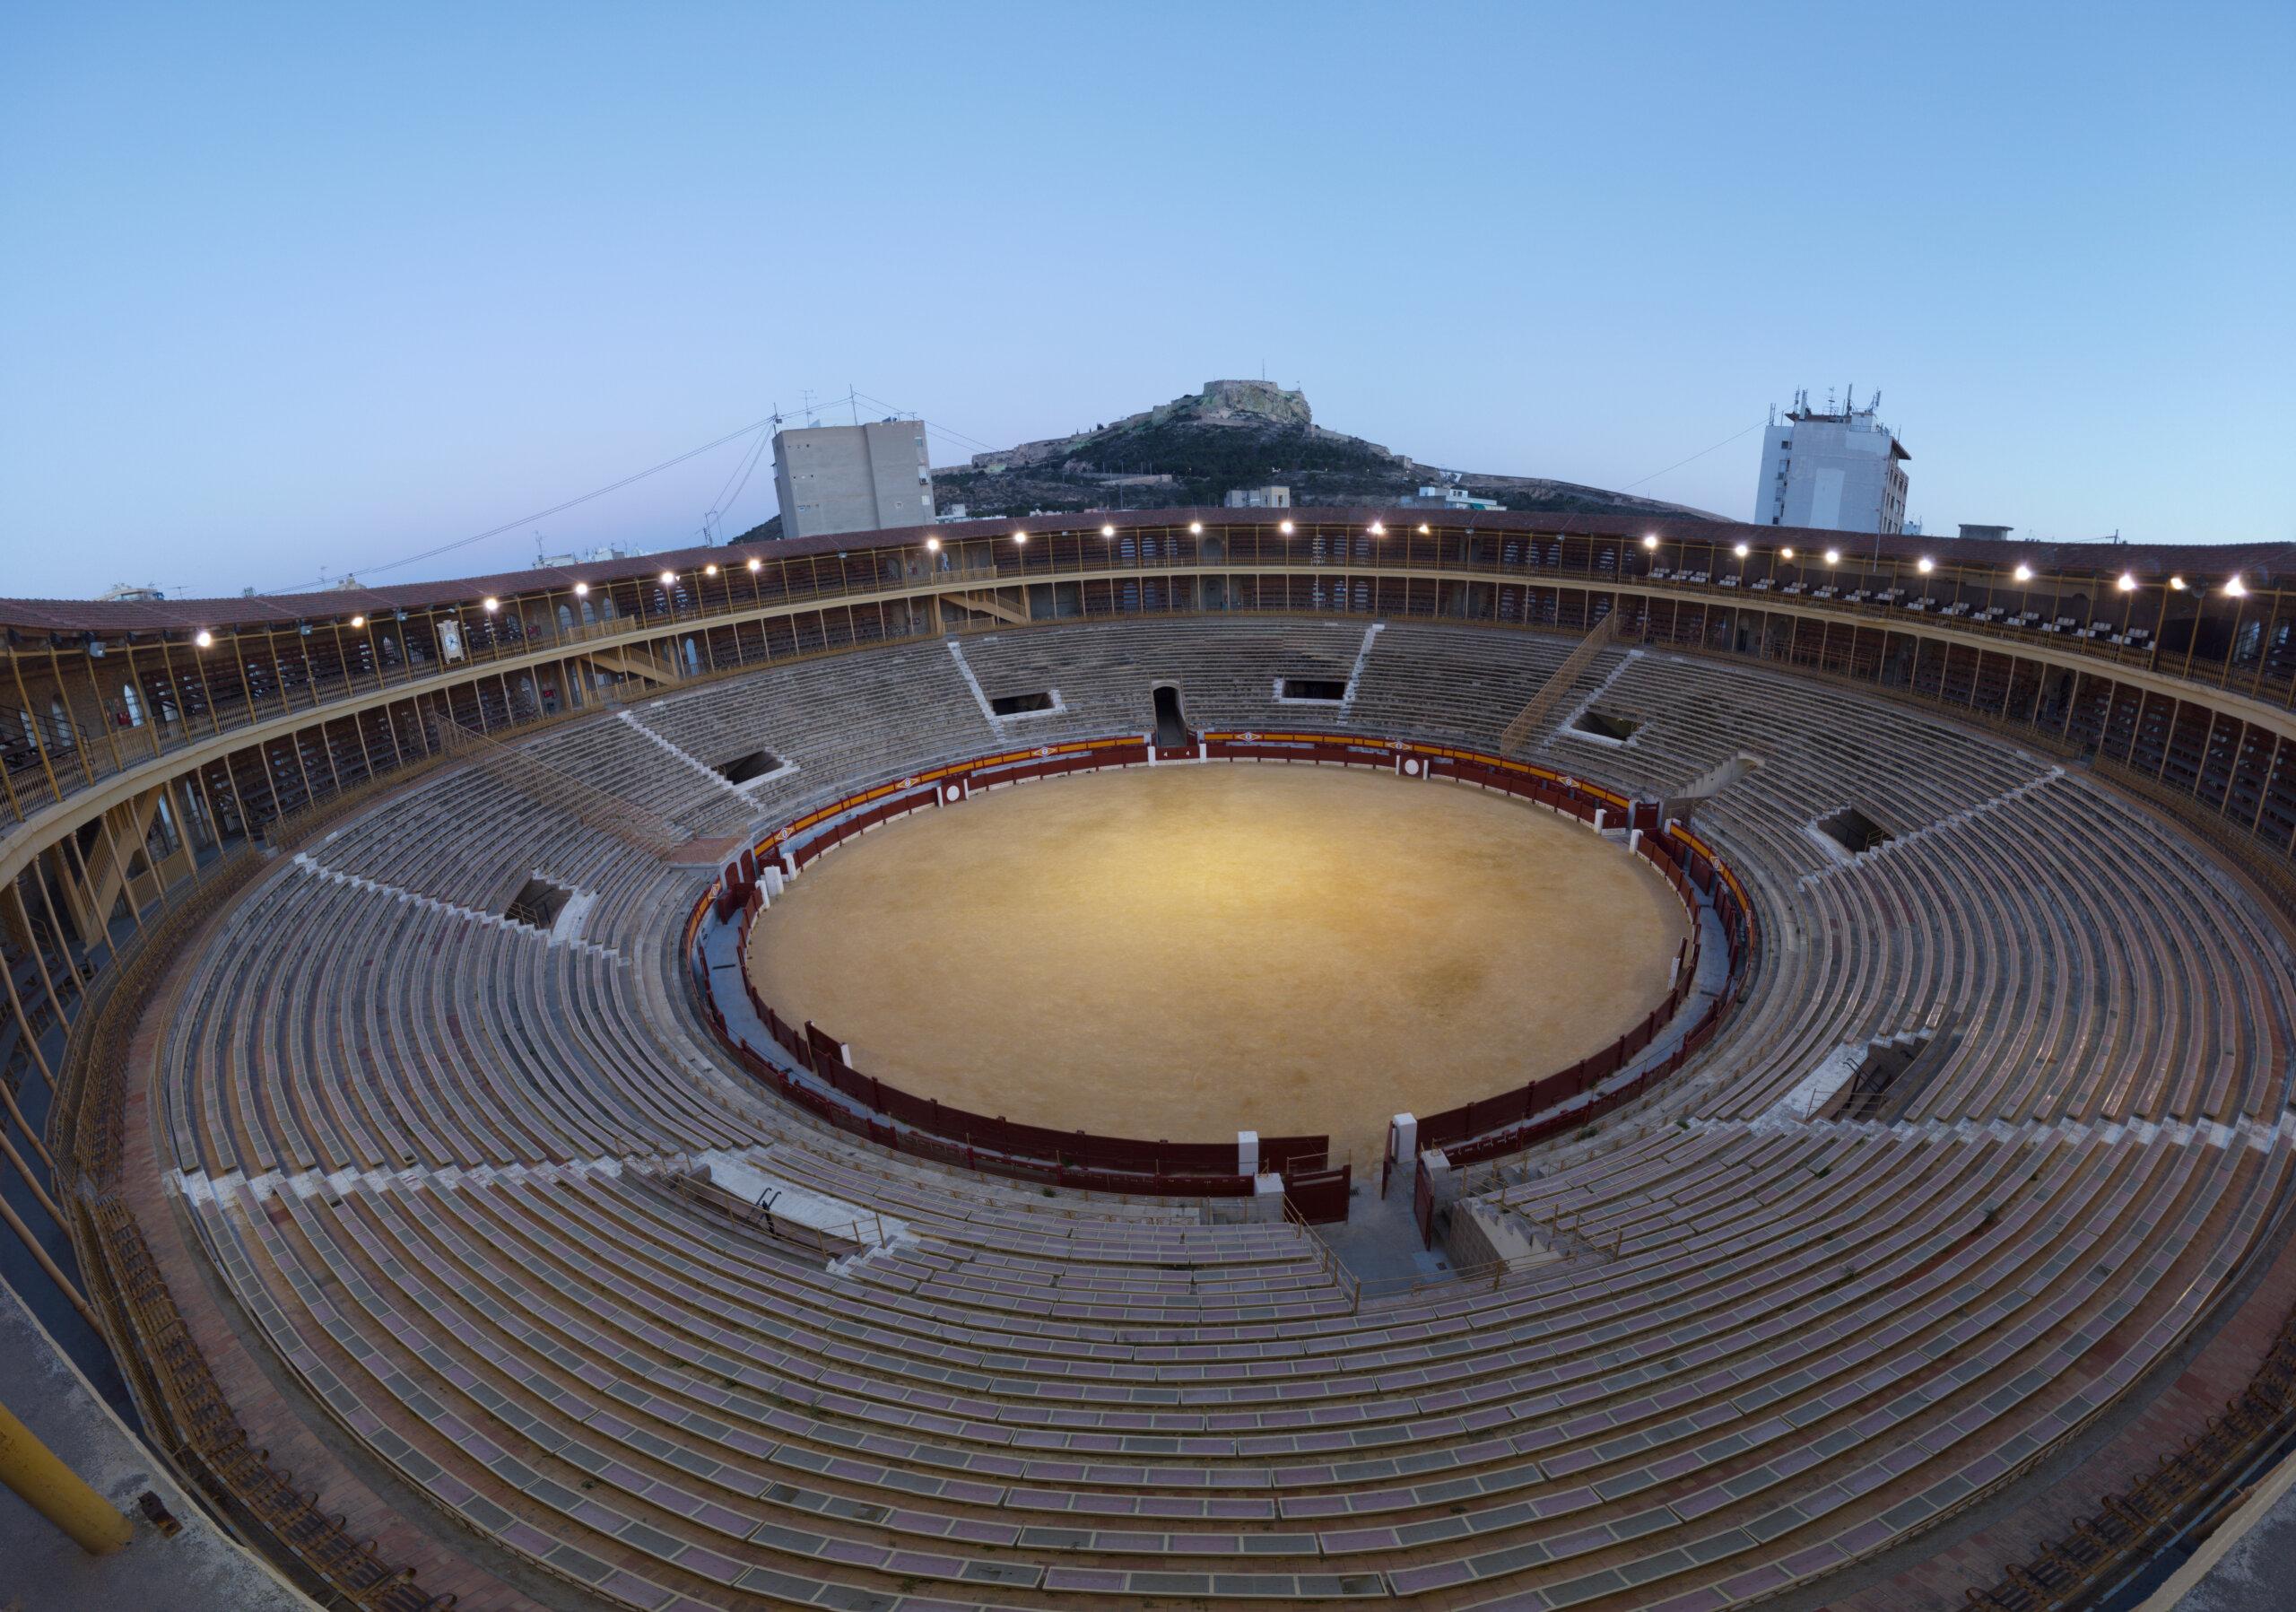 Plaza de Toros de Alicante 186 1 scaled